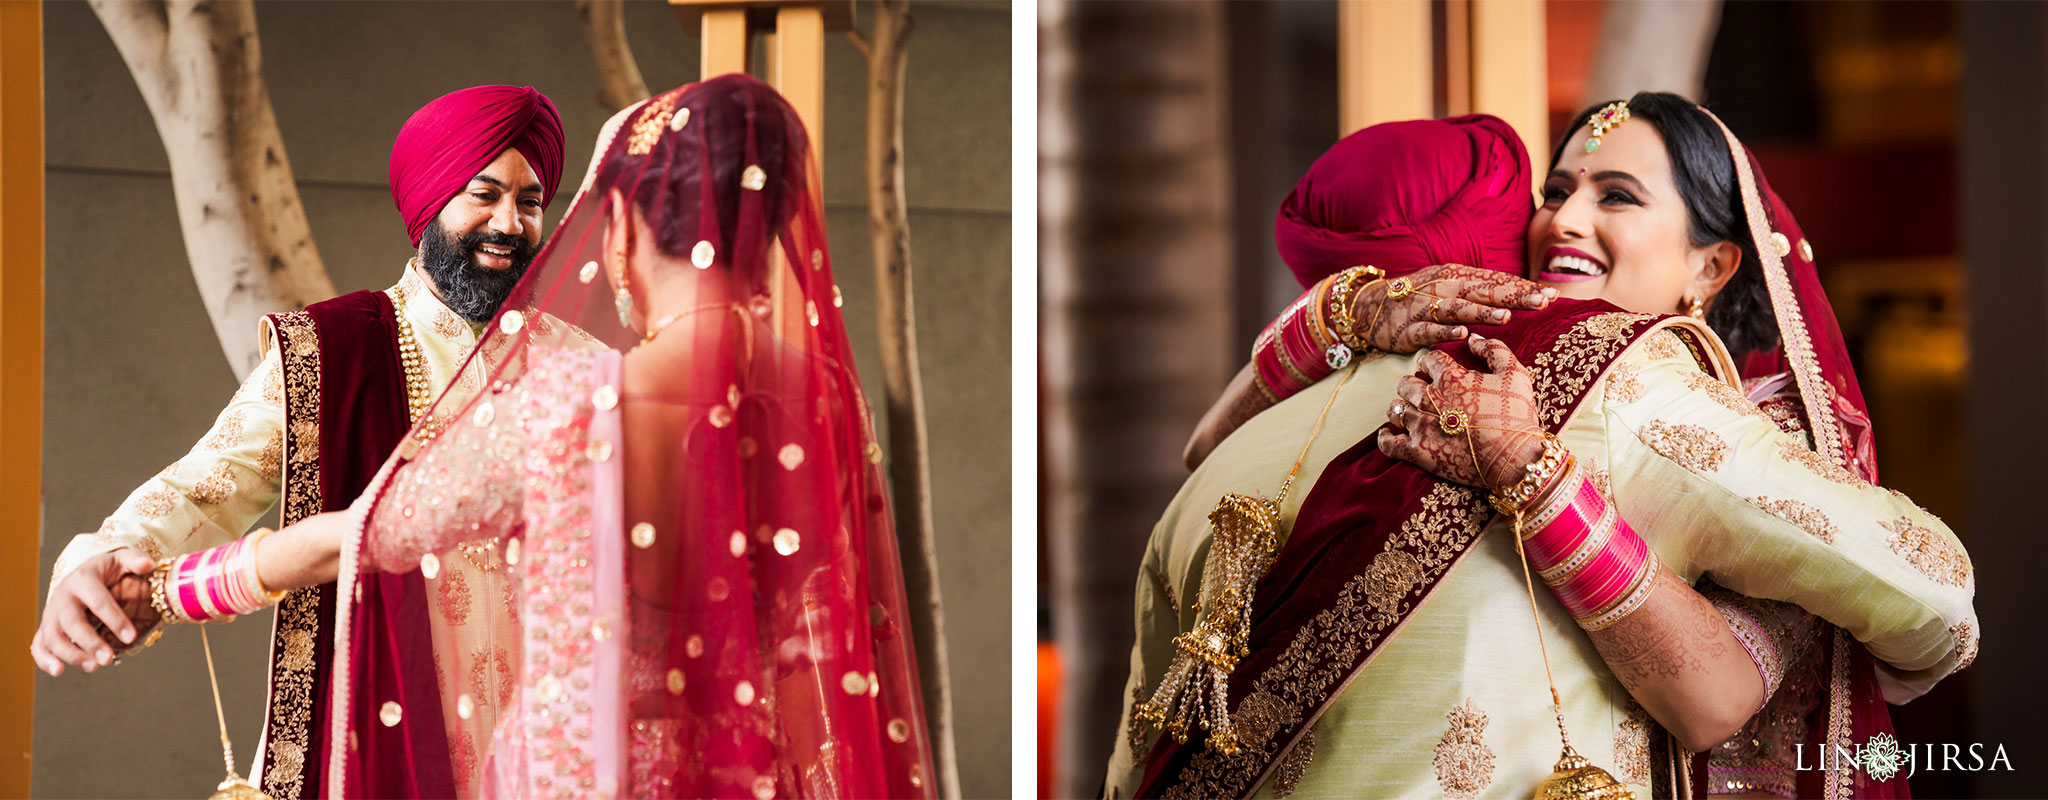 12 marina del rey marriott indian wedding photography